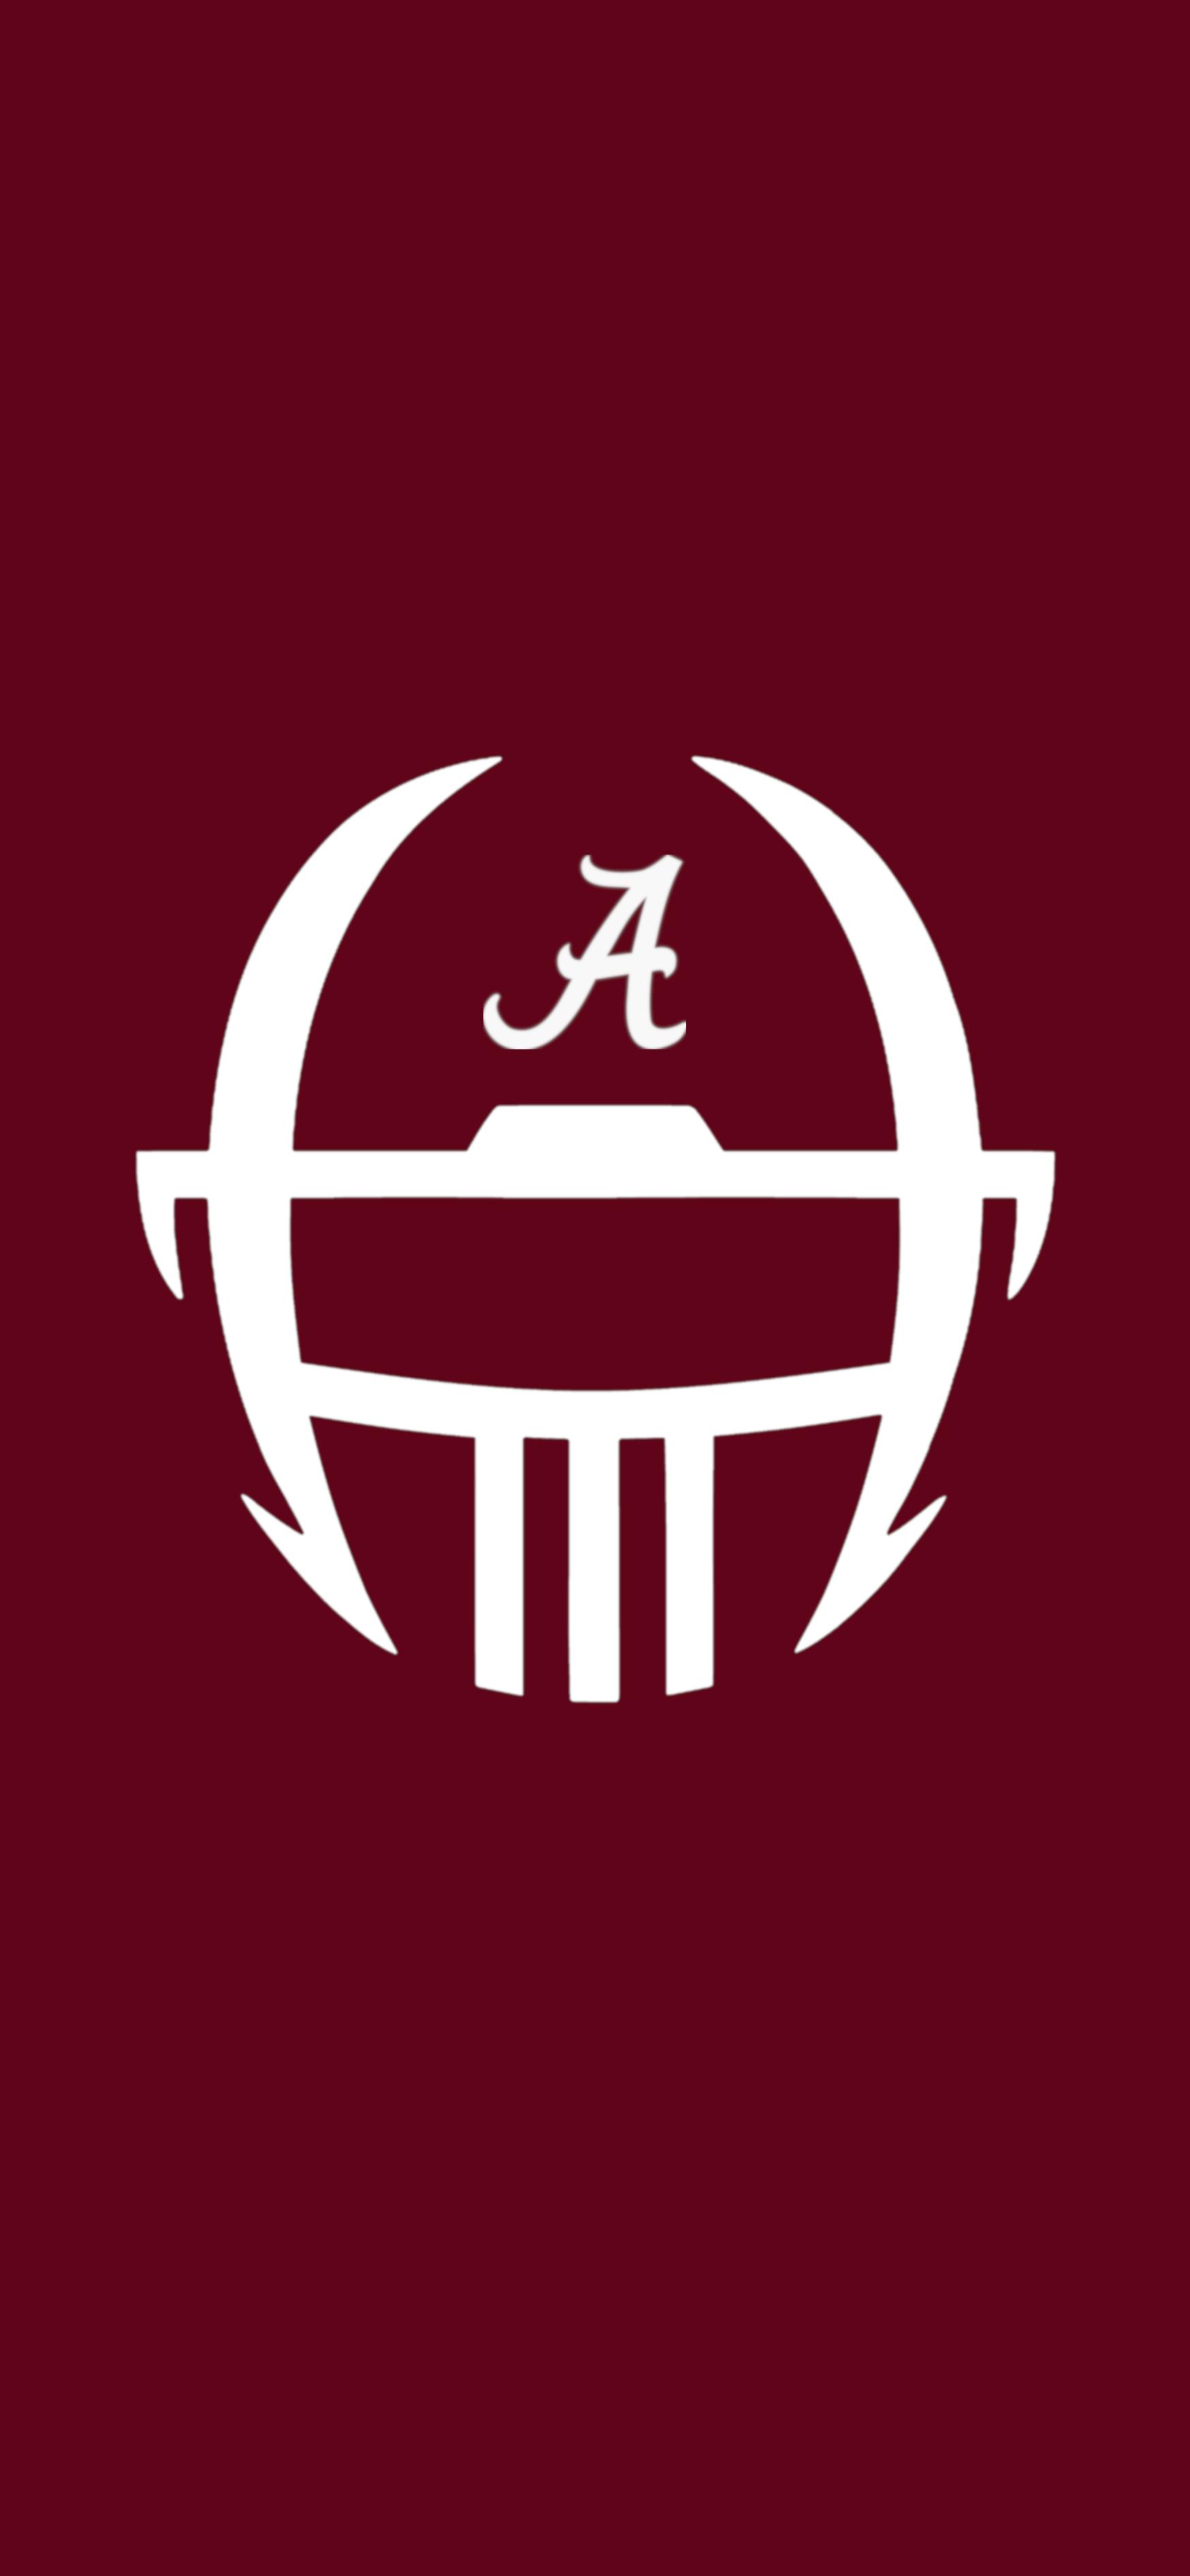 Nike 2 Crimson White Alabama Wallpaper Alabama Crimson Tide Logo Alabama Crimson Tide Football